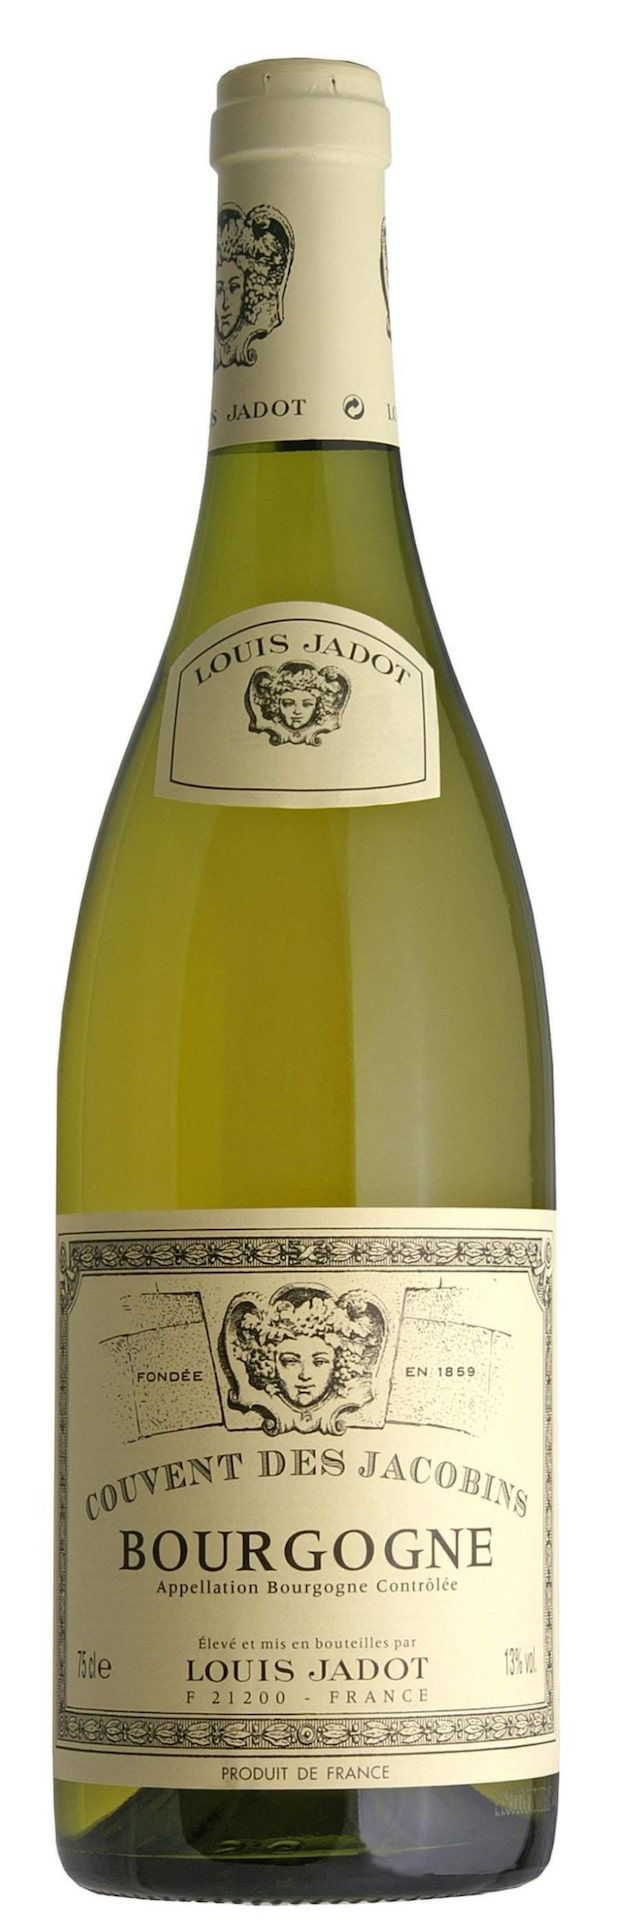 Couvent des Jacobins Bourgogne Blanc 2012 (5798) Frankrike, 119 kr